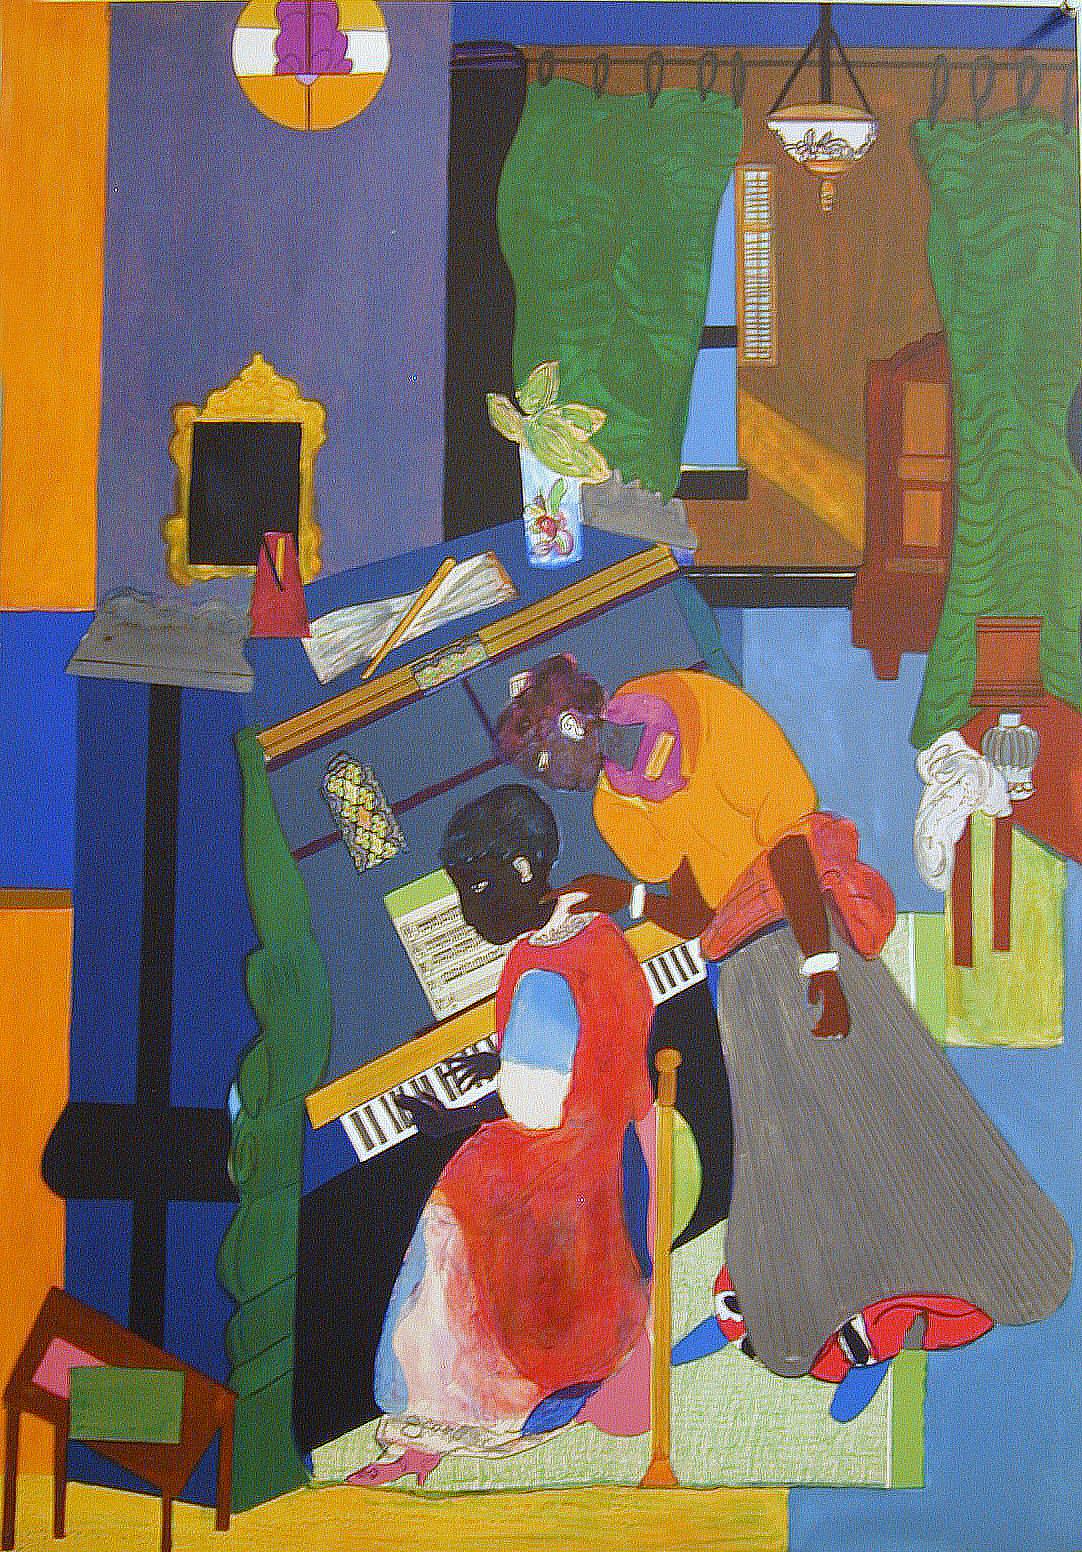 Romare Bearden,  The Piano Lesson   ,  1983     Image courtesy of Art @ Romare Bearden Foundation/Licensed by VAGA, New York, NY